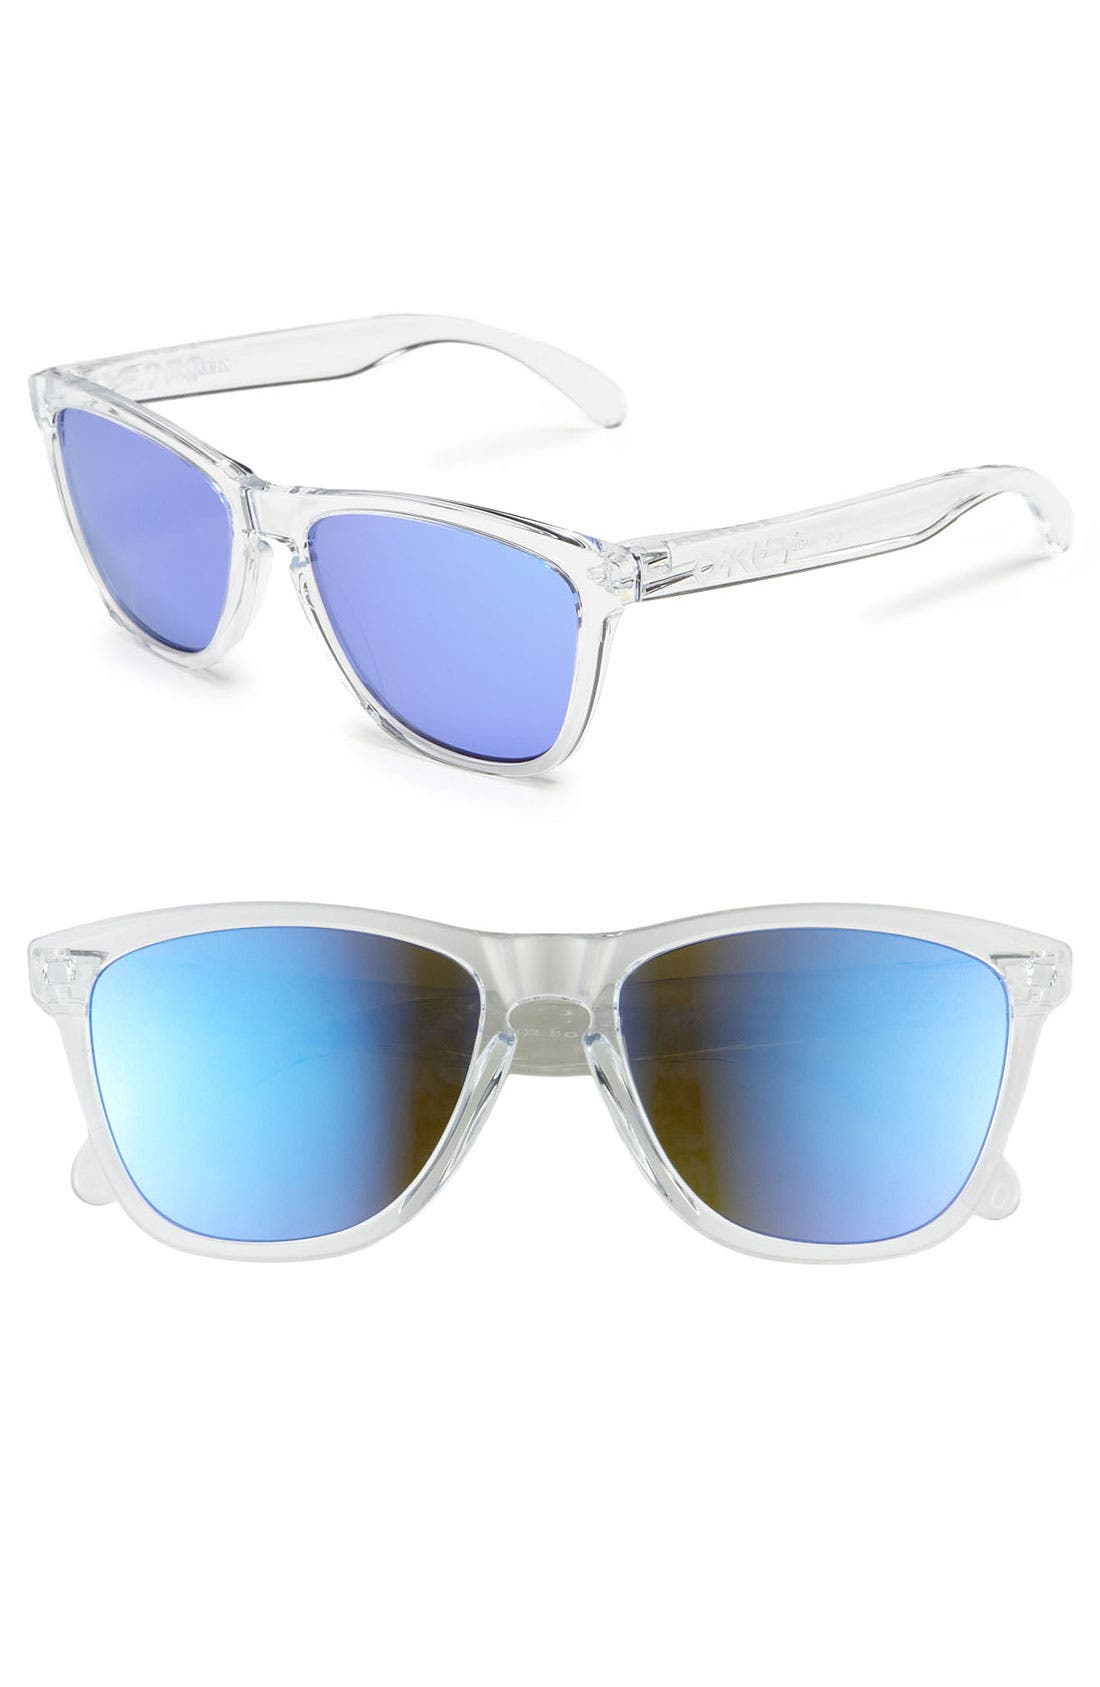 Alternate Image 1 Selected - Oakley 'Frogskins®' 55mm Sunglasses